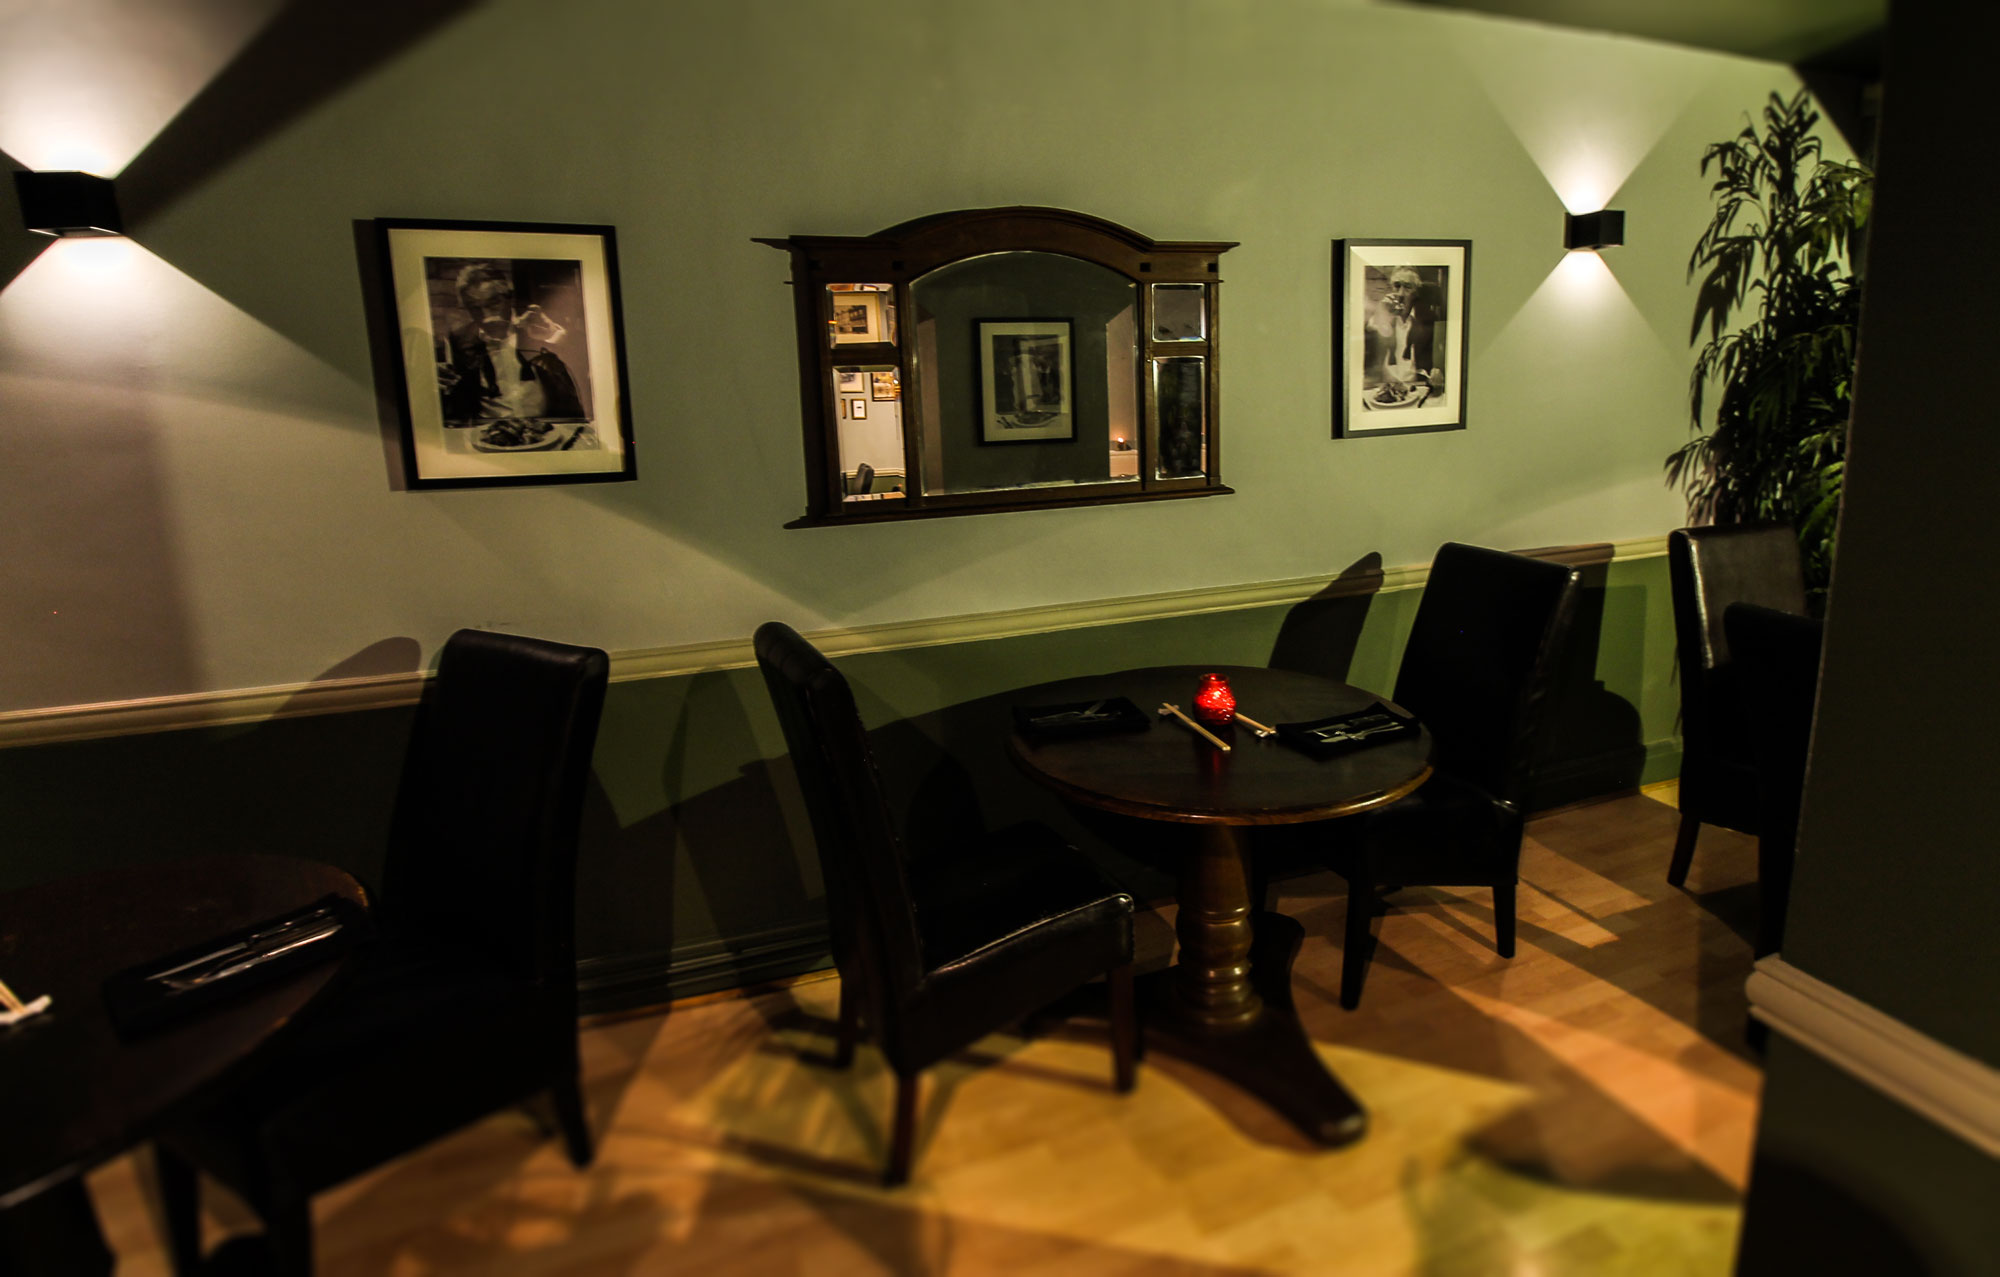 Tigers-Eye-Restaurant-Tables